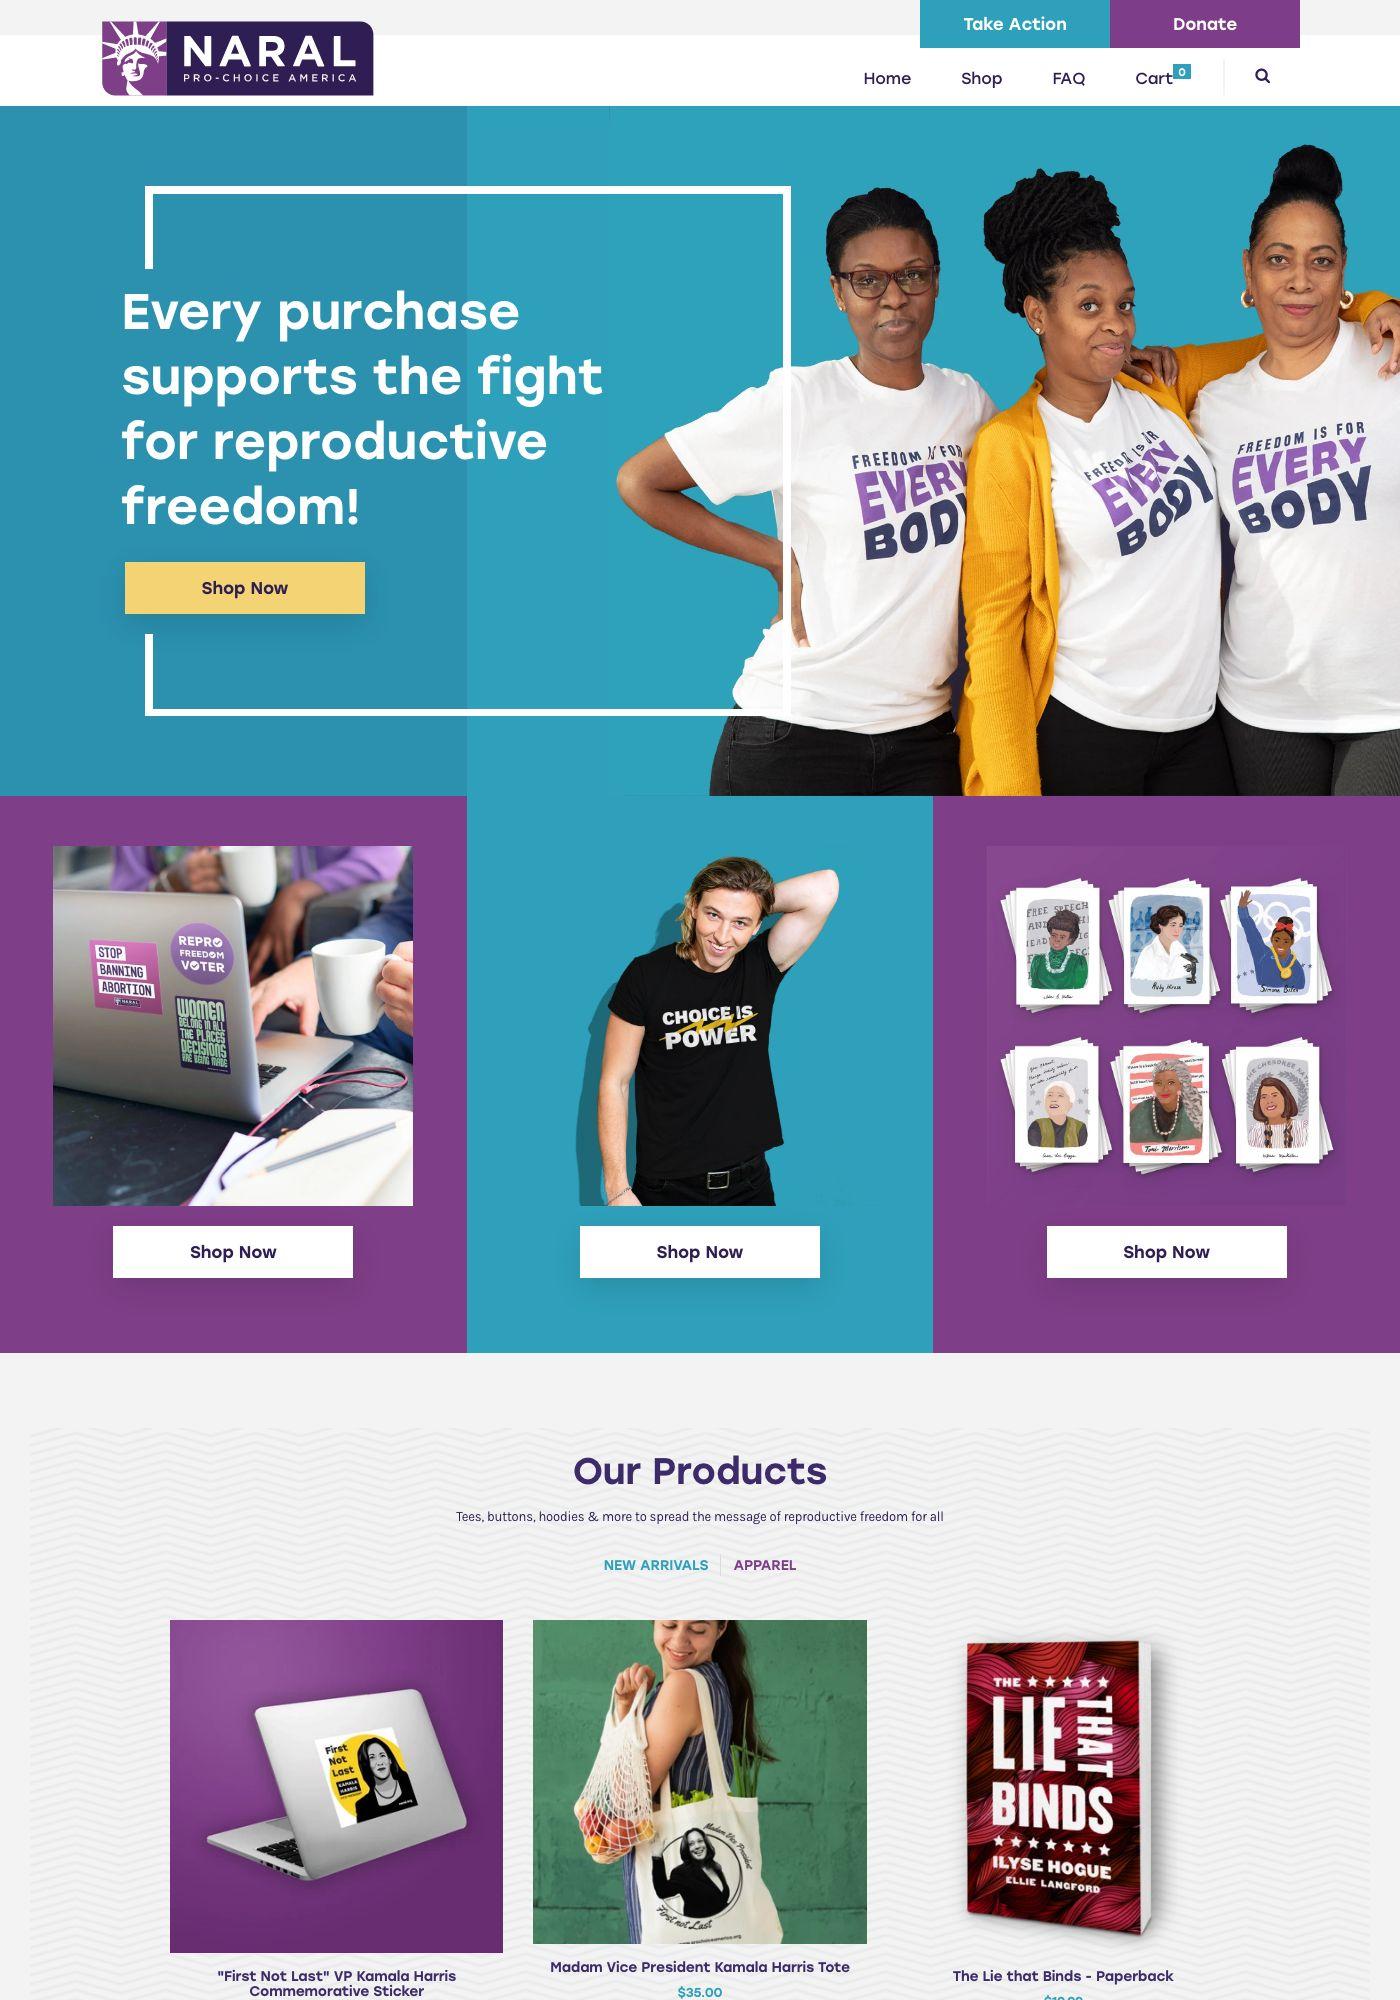 shop.prochoiceamerica.org